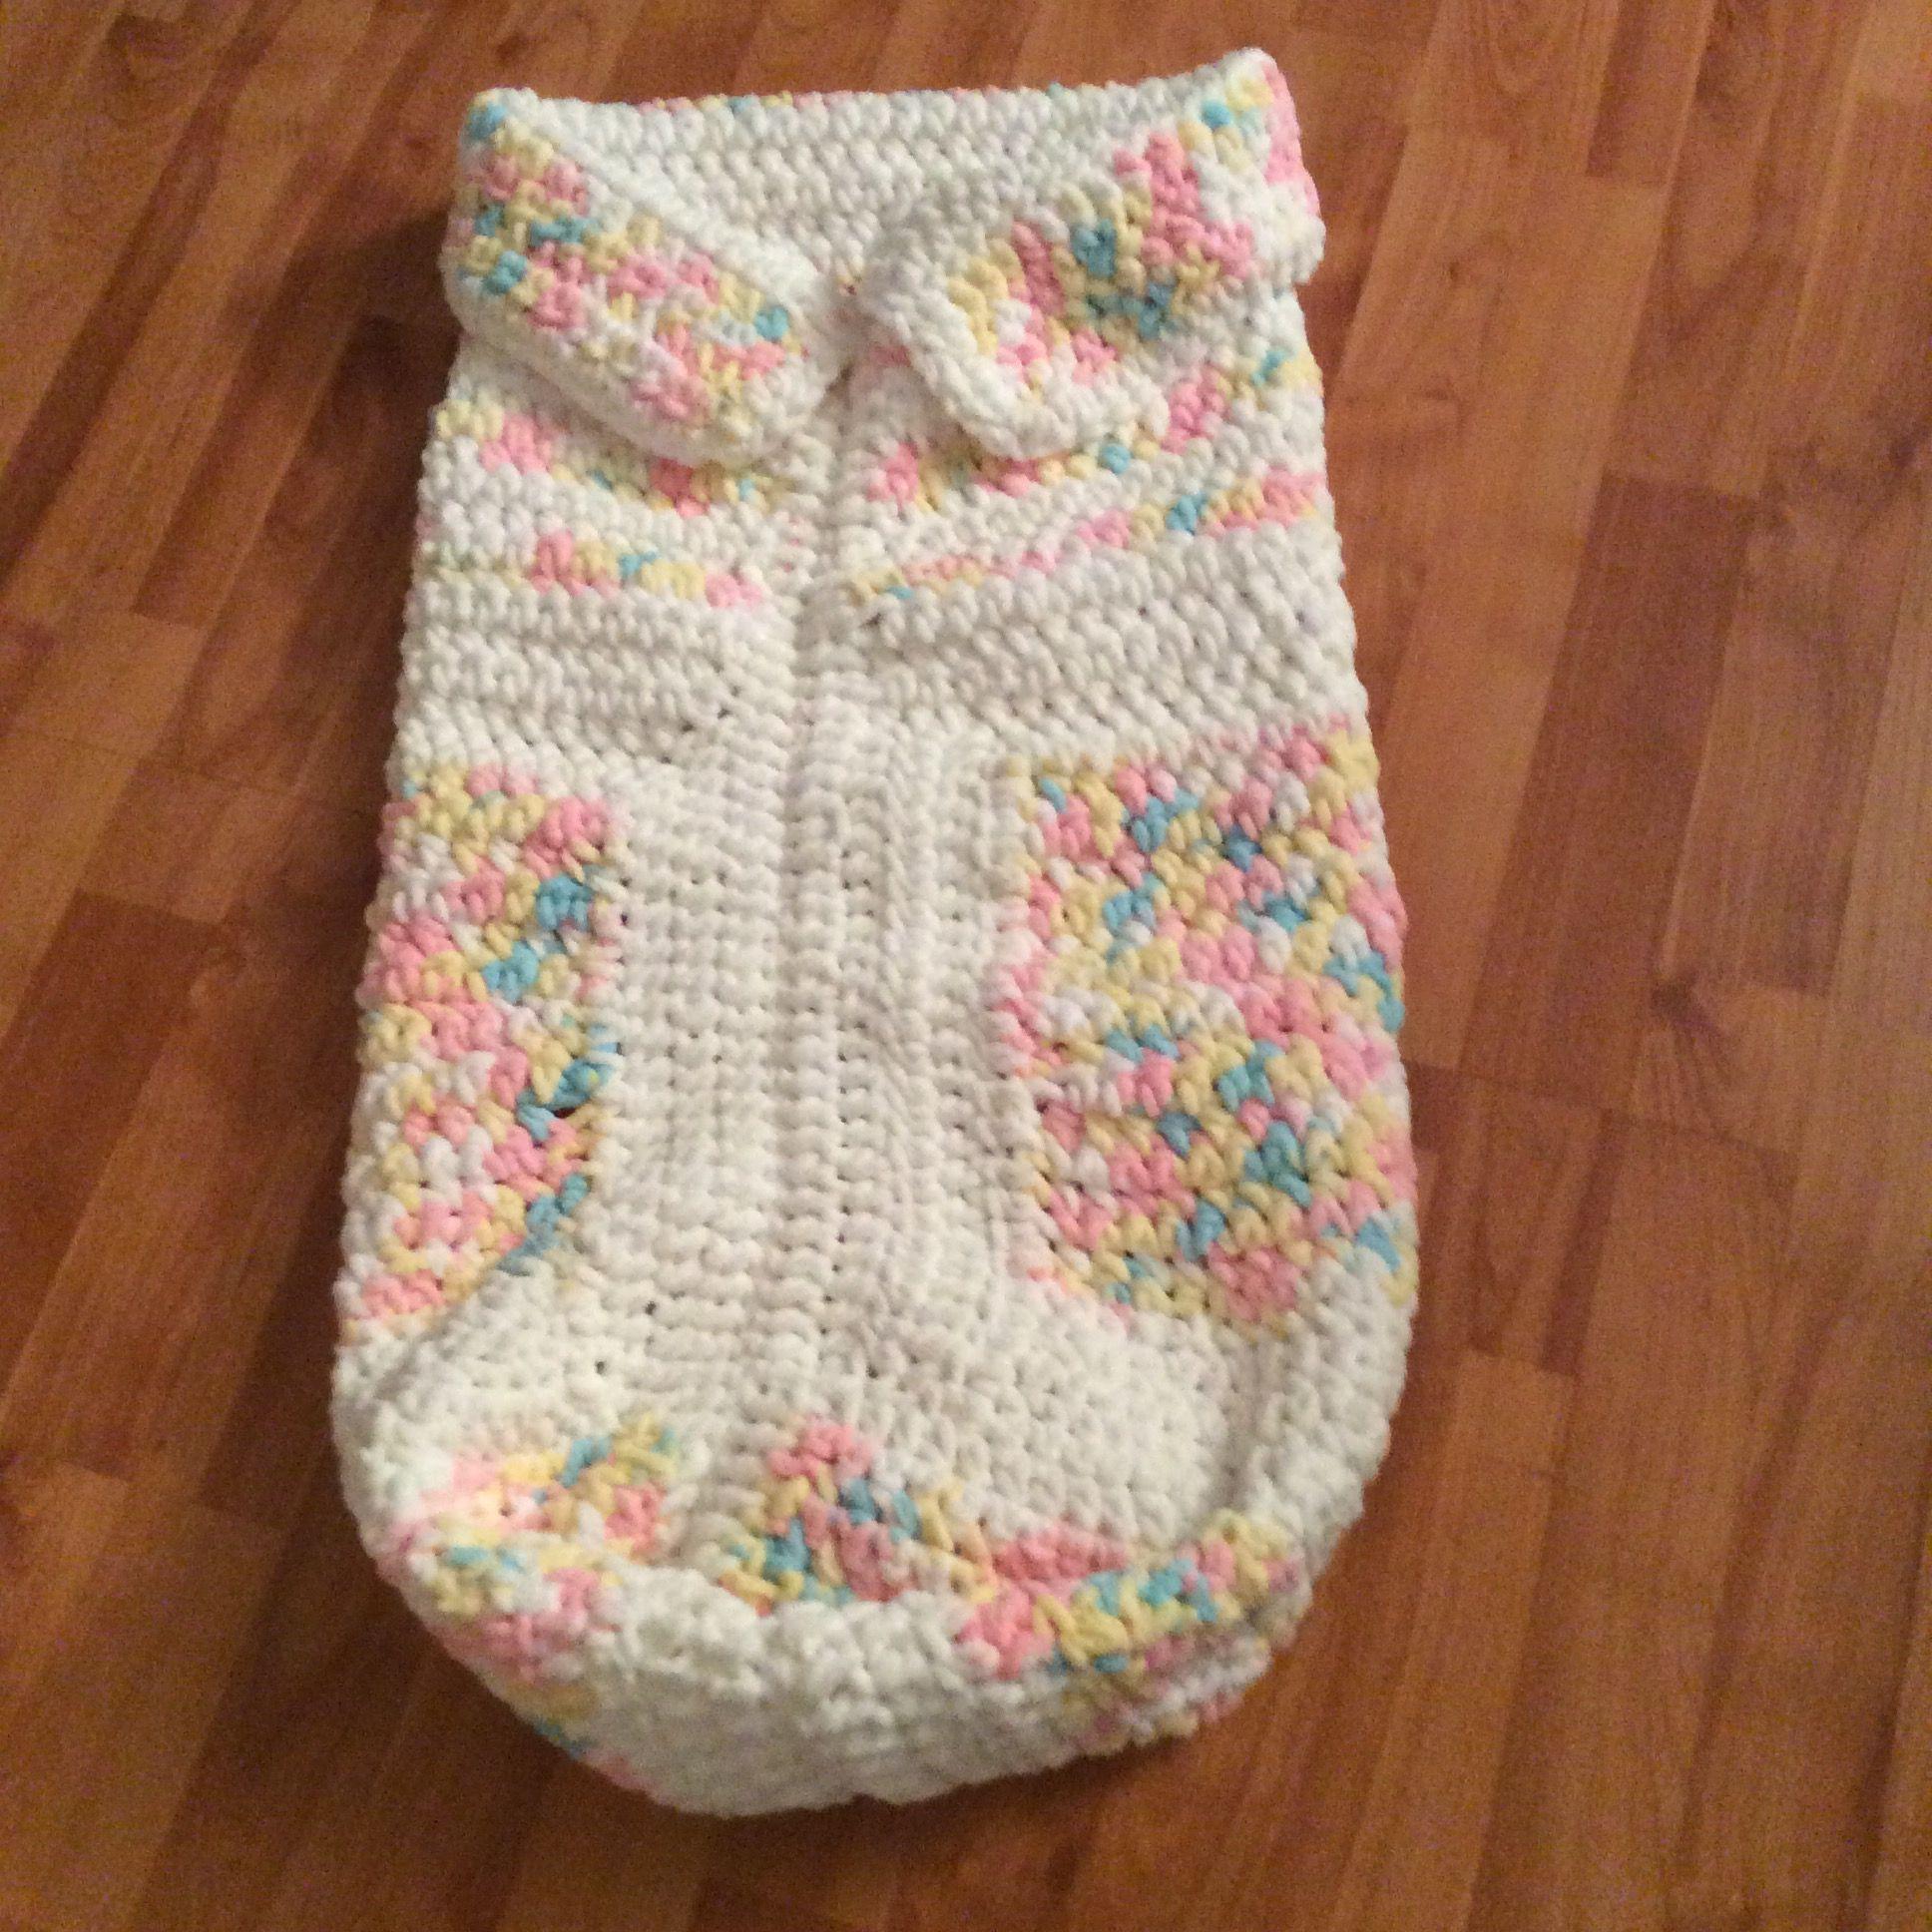 Baby sleeping bag crocheted with Bernat Baby Blanket yarn